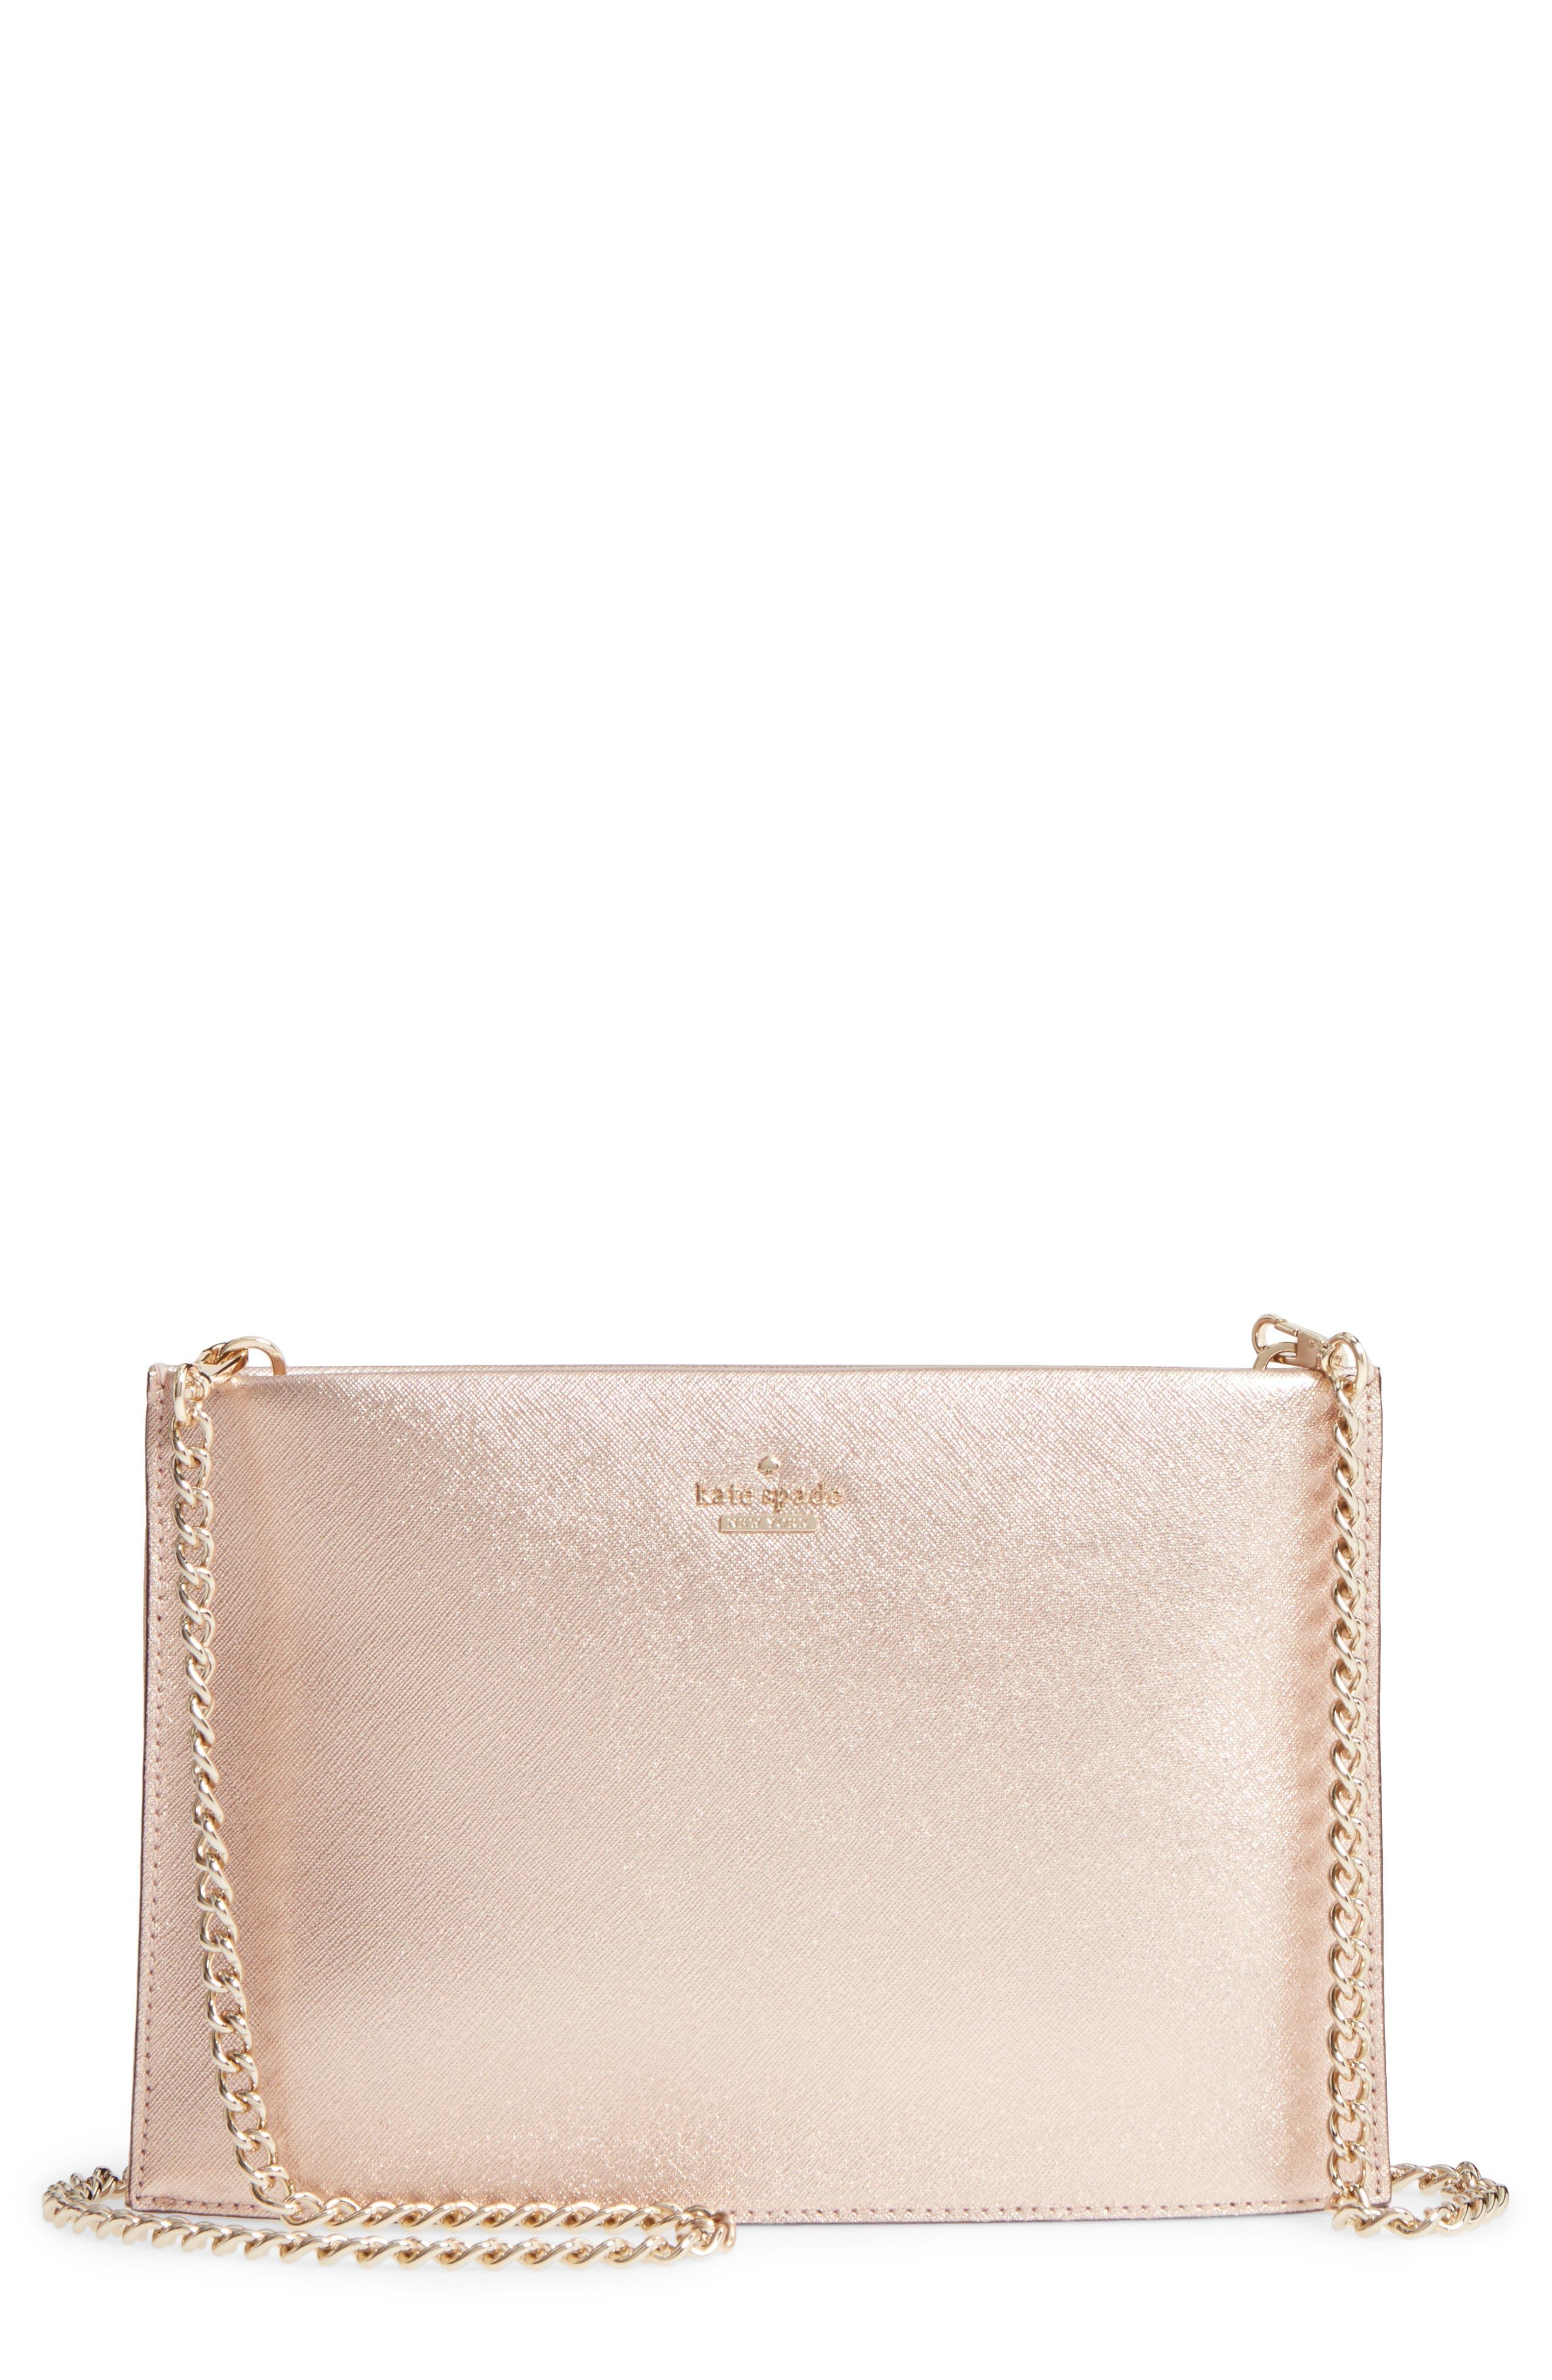 cameron street - sima leather crossbody bag,                             Main thumbnail 1, color,                             650